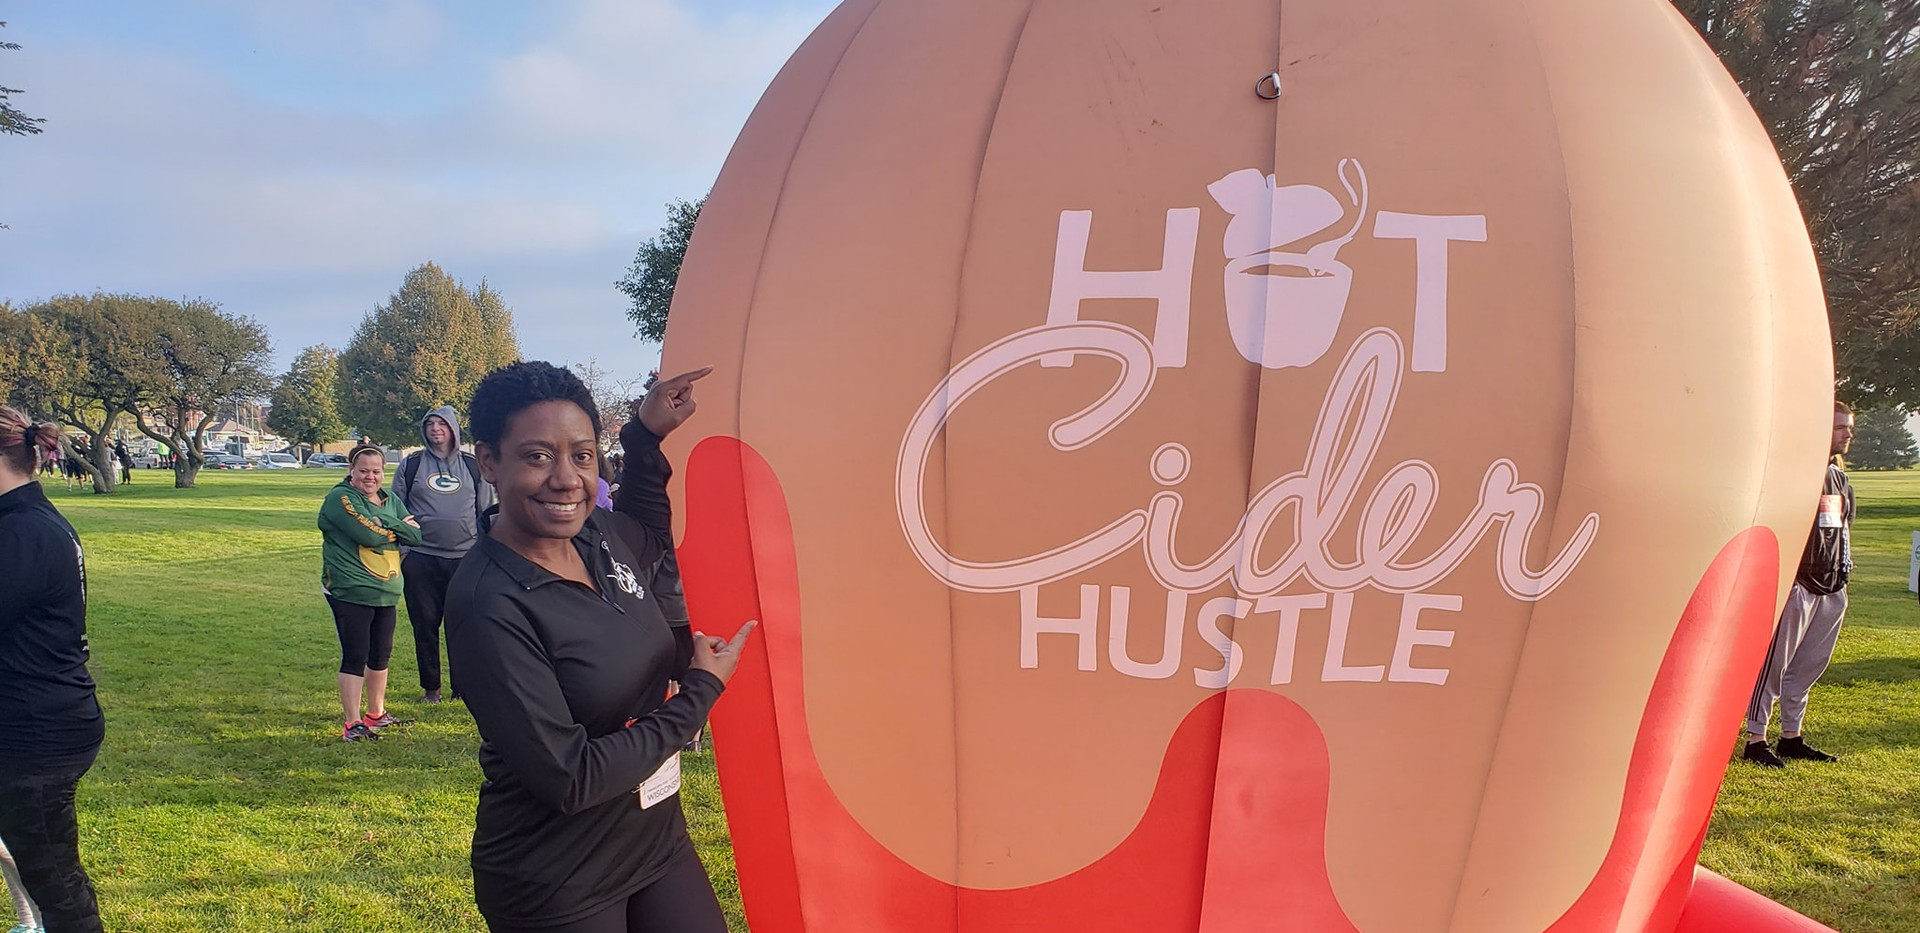 Angela posing with the Hot Cider Hustle ballon